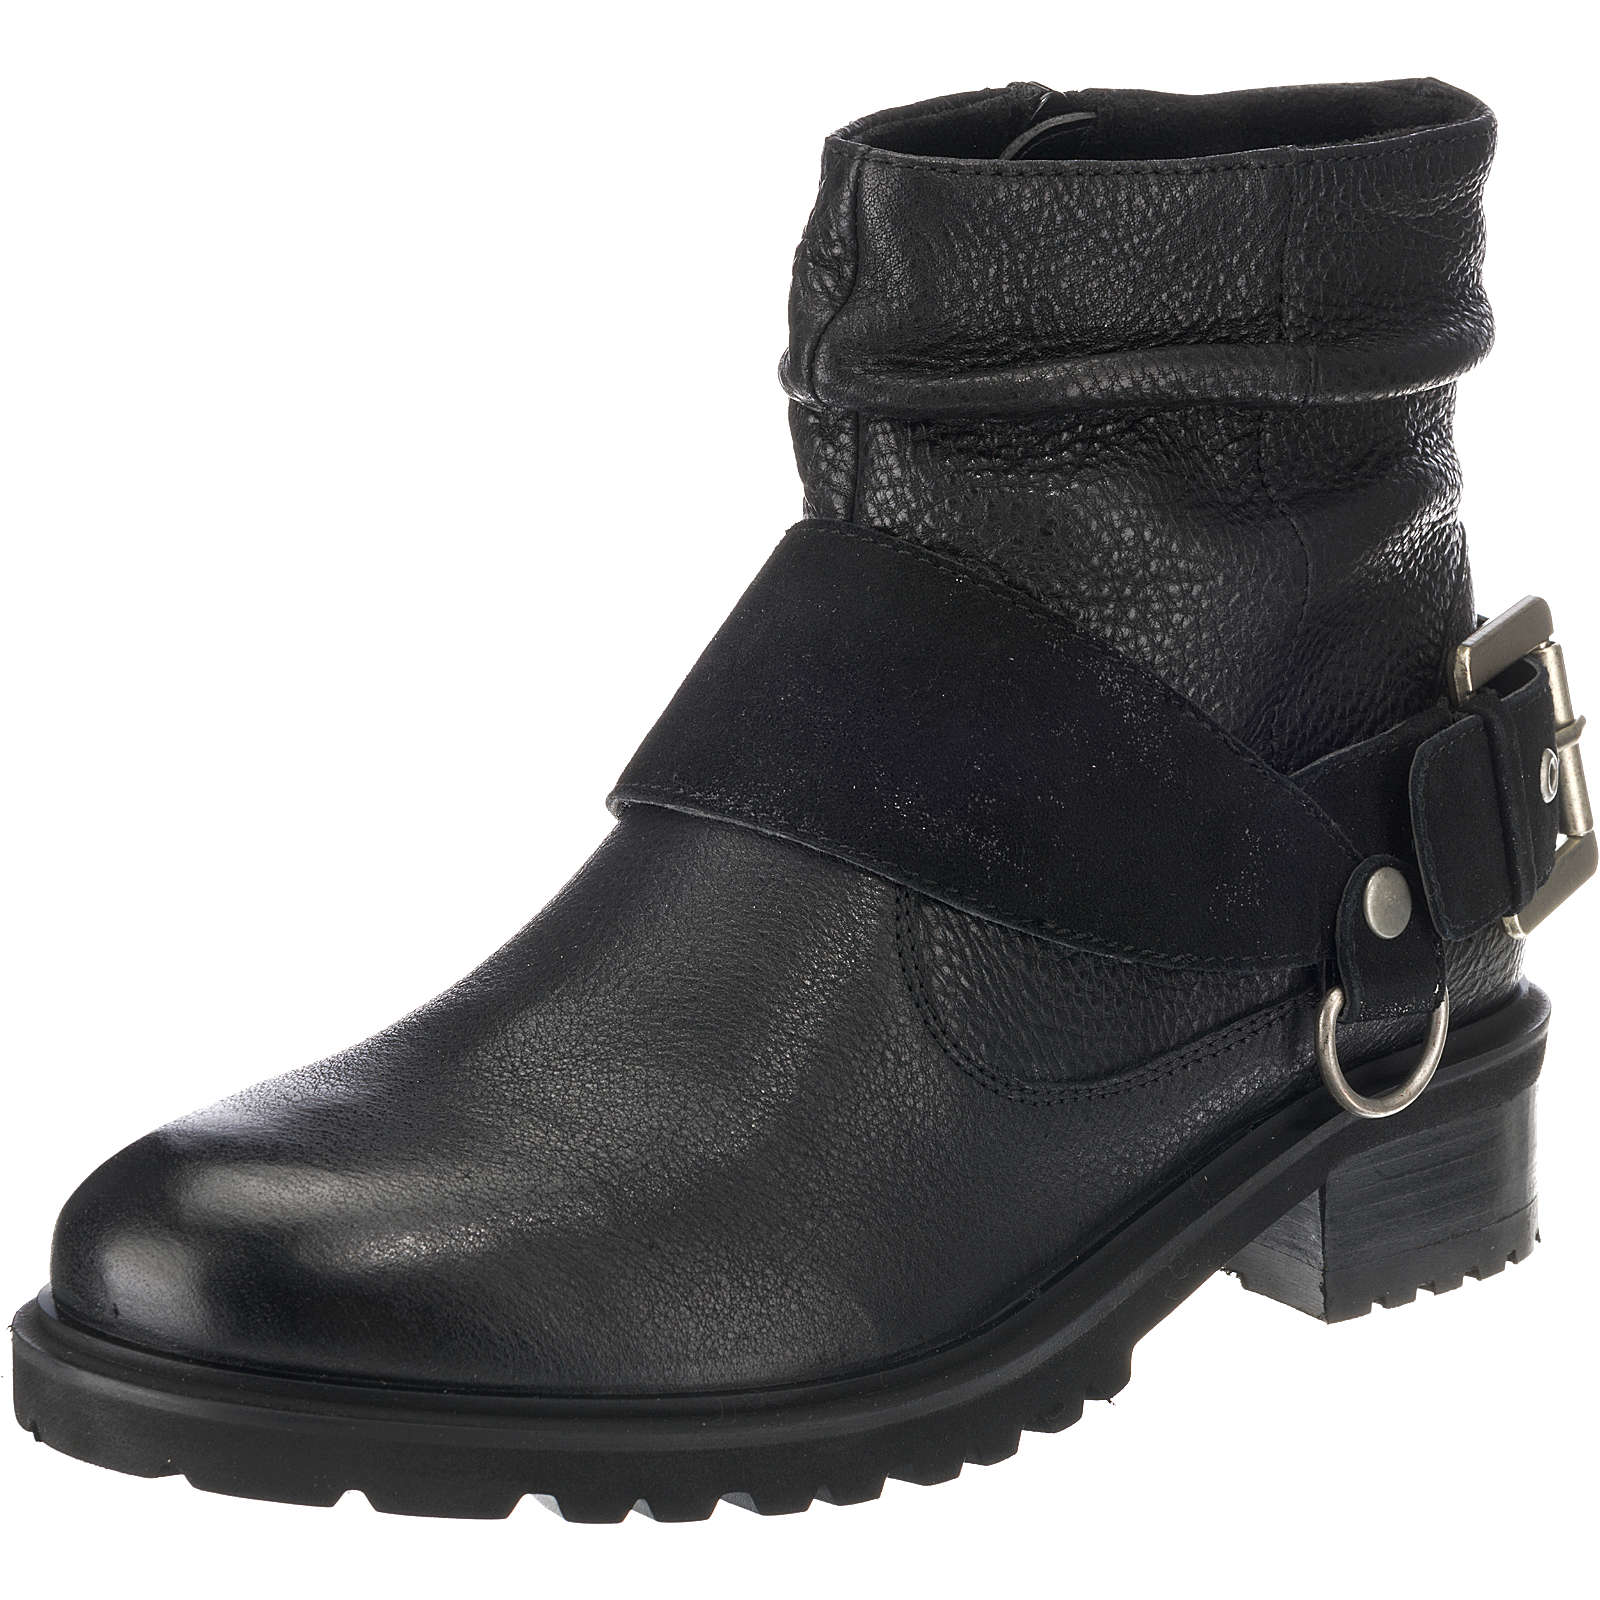 SPM Biker Boots schwarz Damen Gr. 36